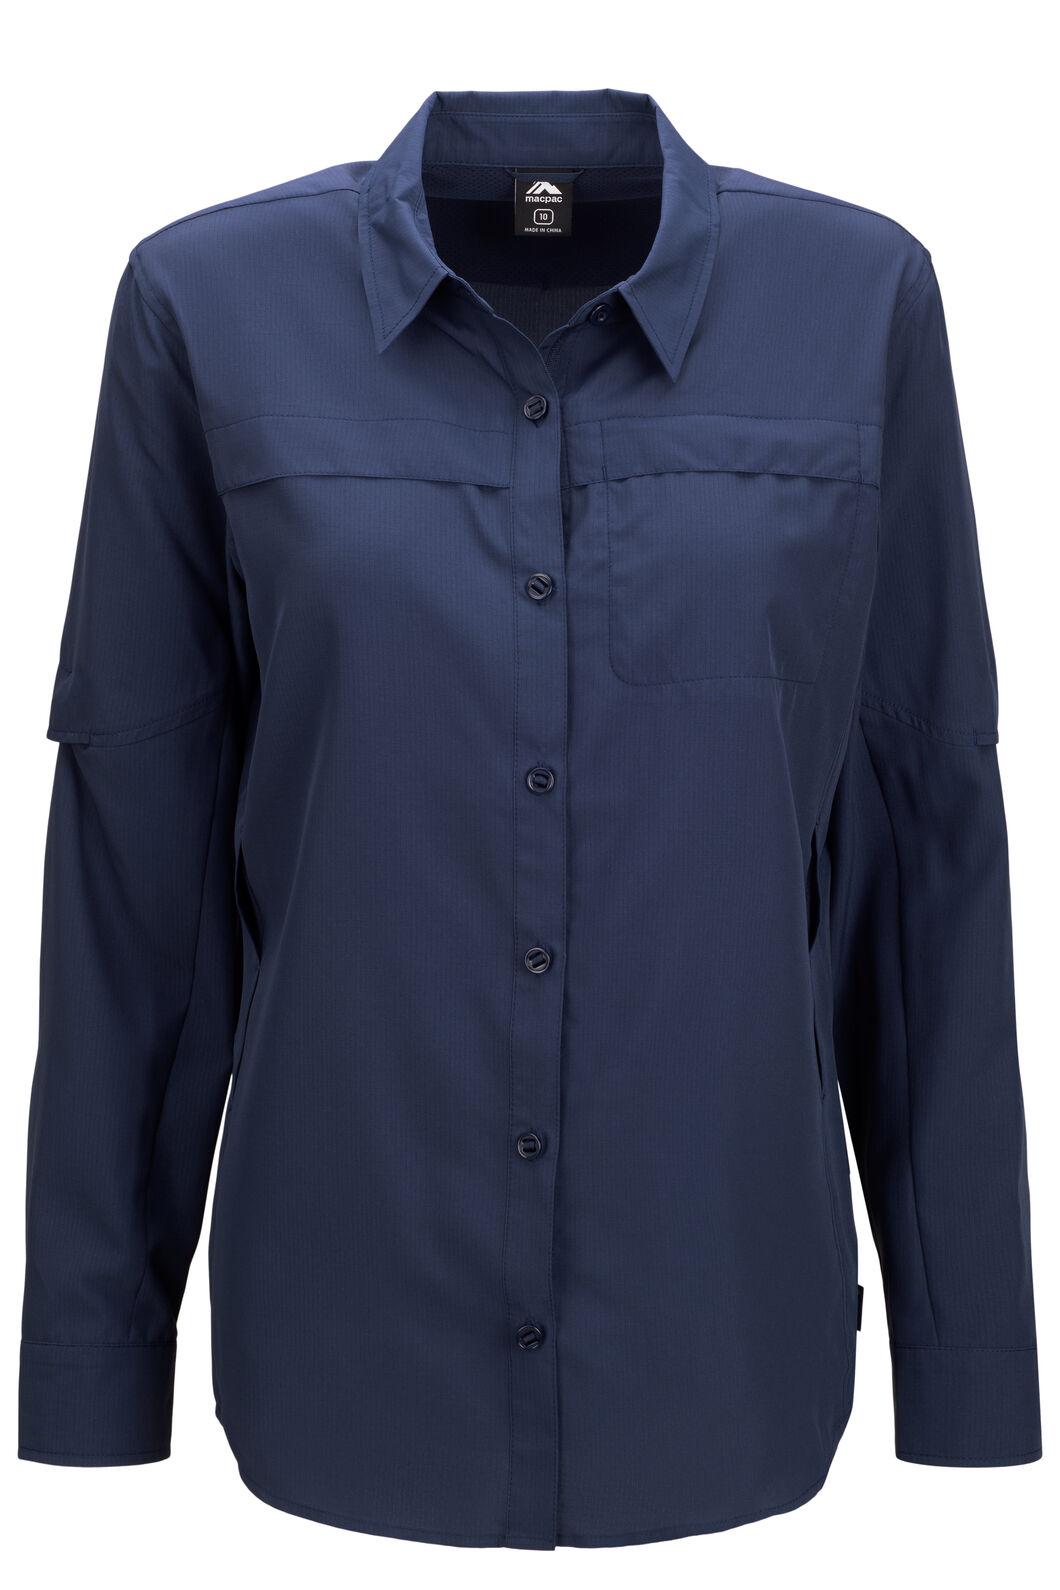 Macpac Women's Ranger Long Sleeve Shirt, Navy Iris, hi-res